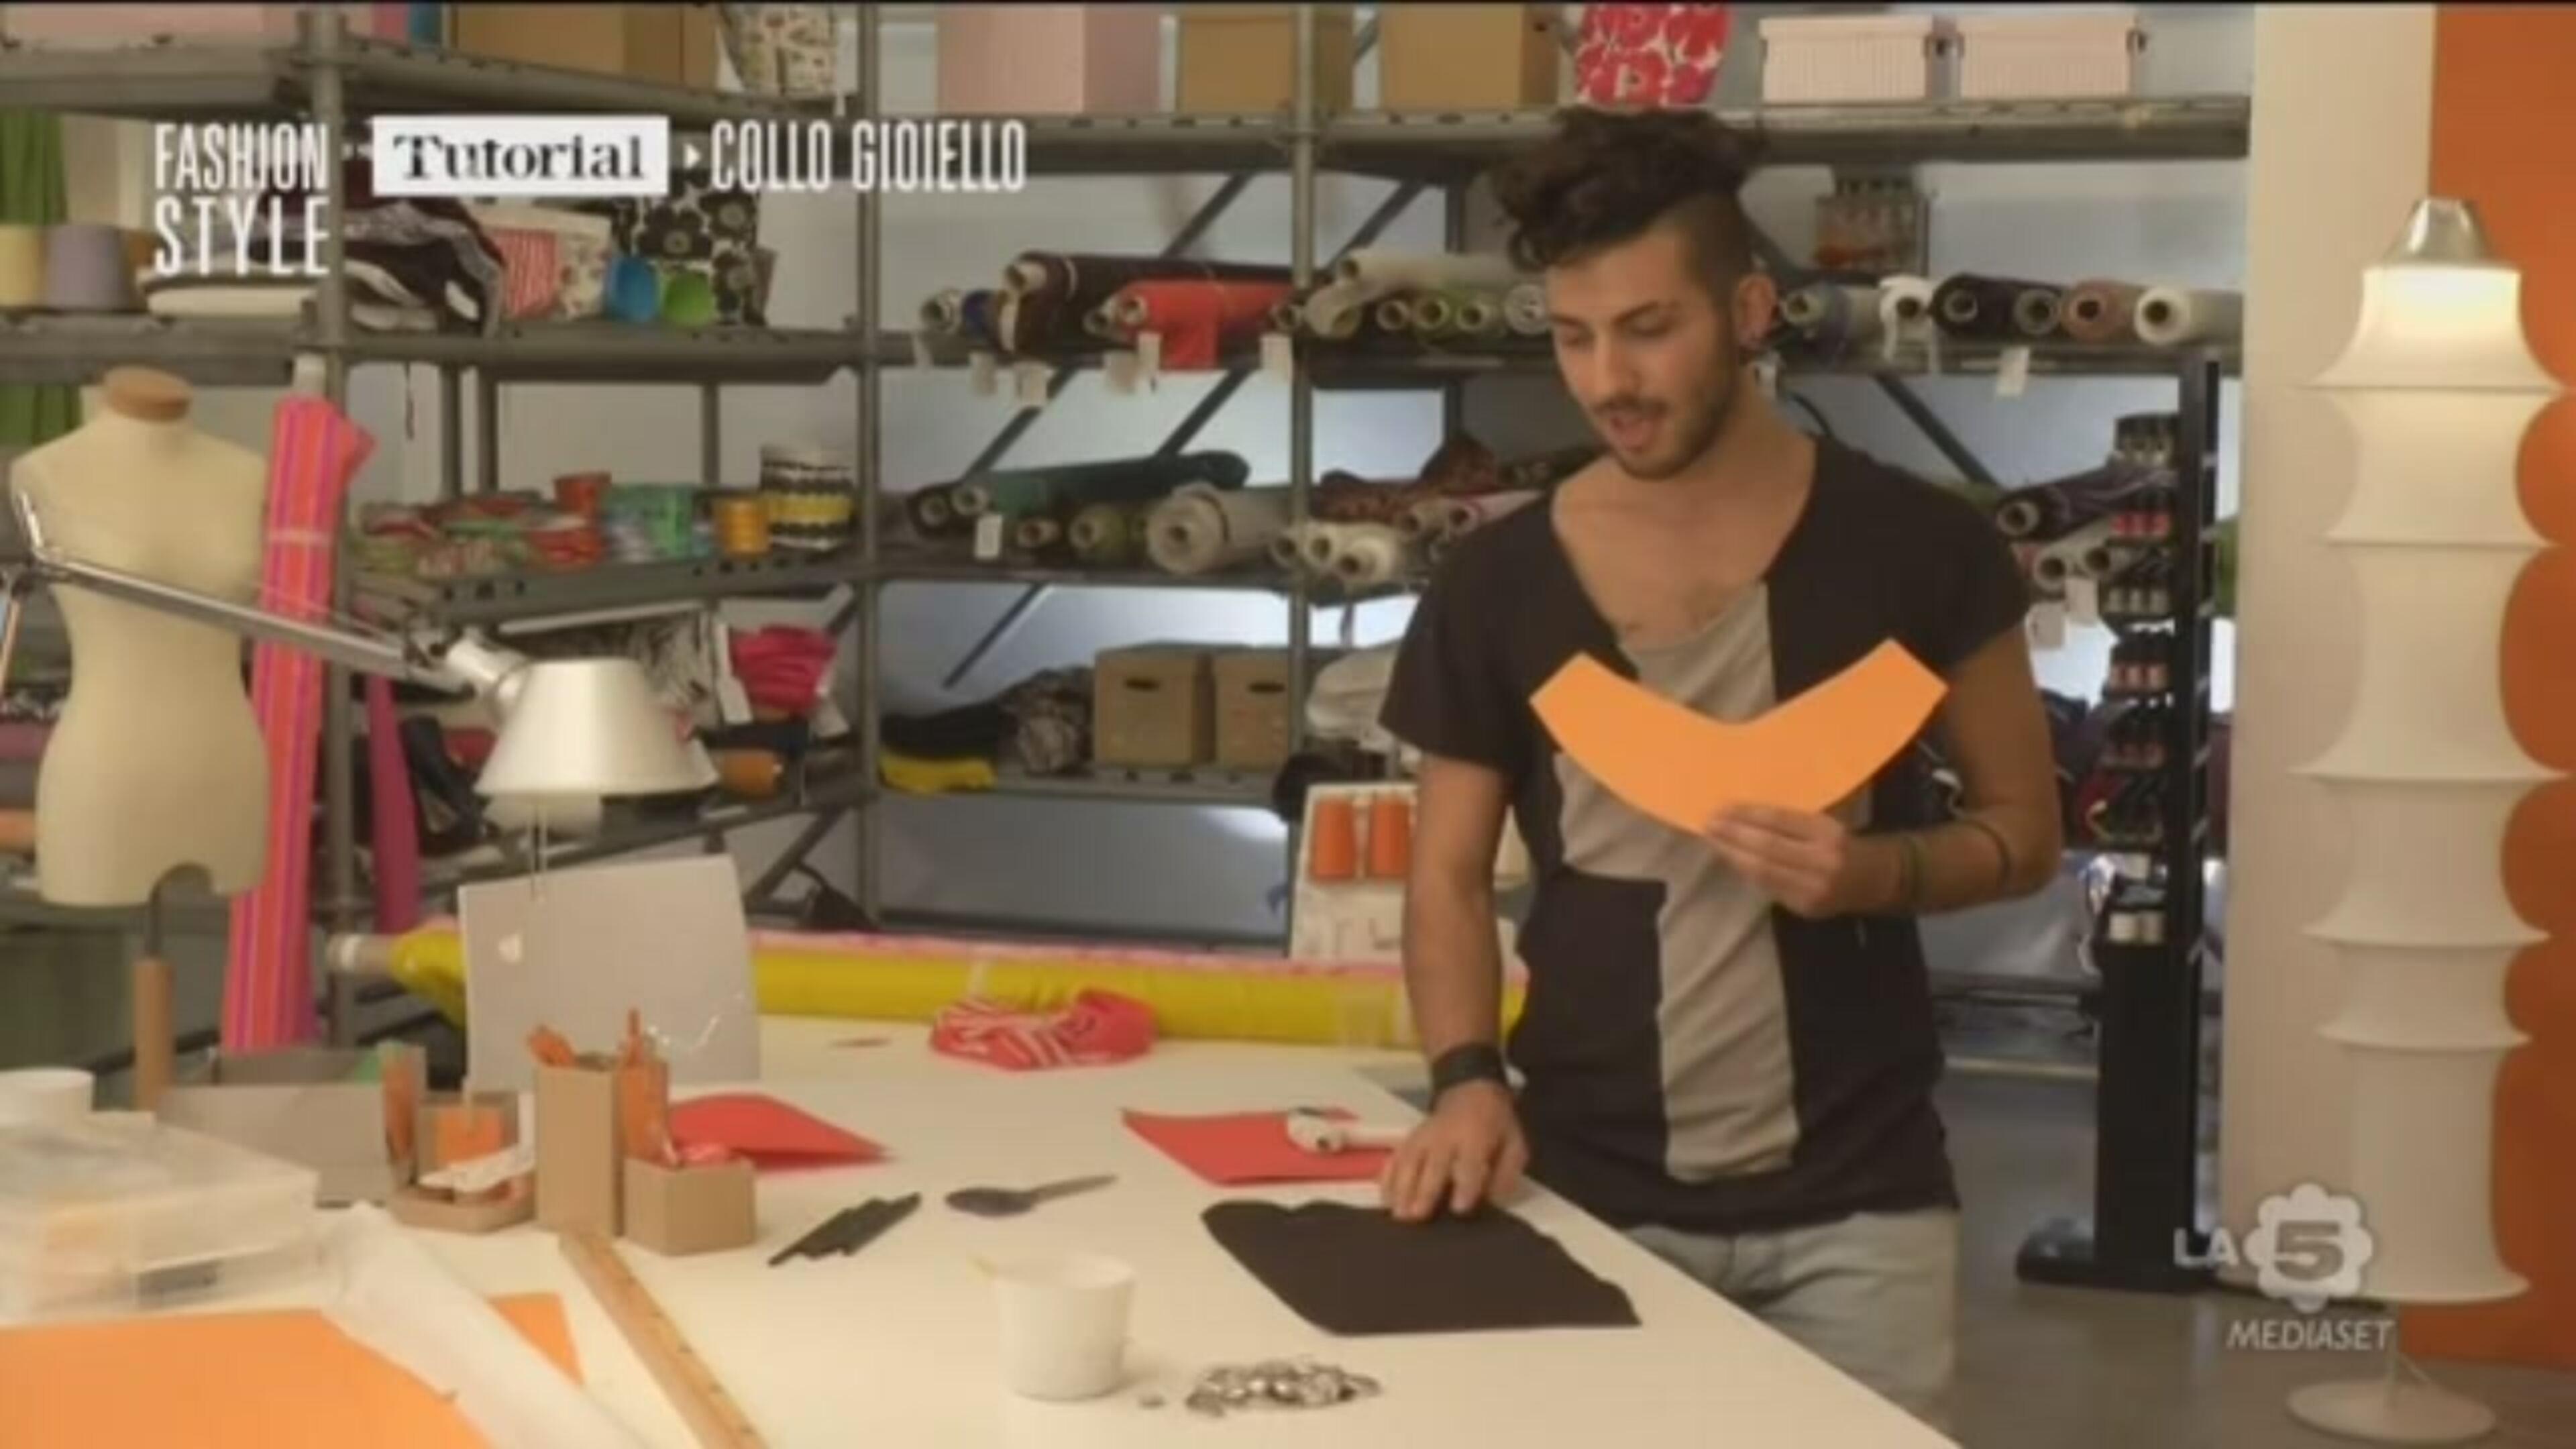 Fashion Style Tutorial Collo Gioiello 2 Video Mediaset